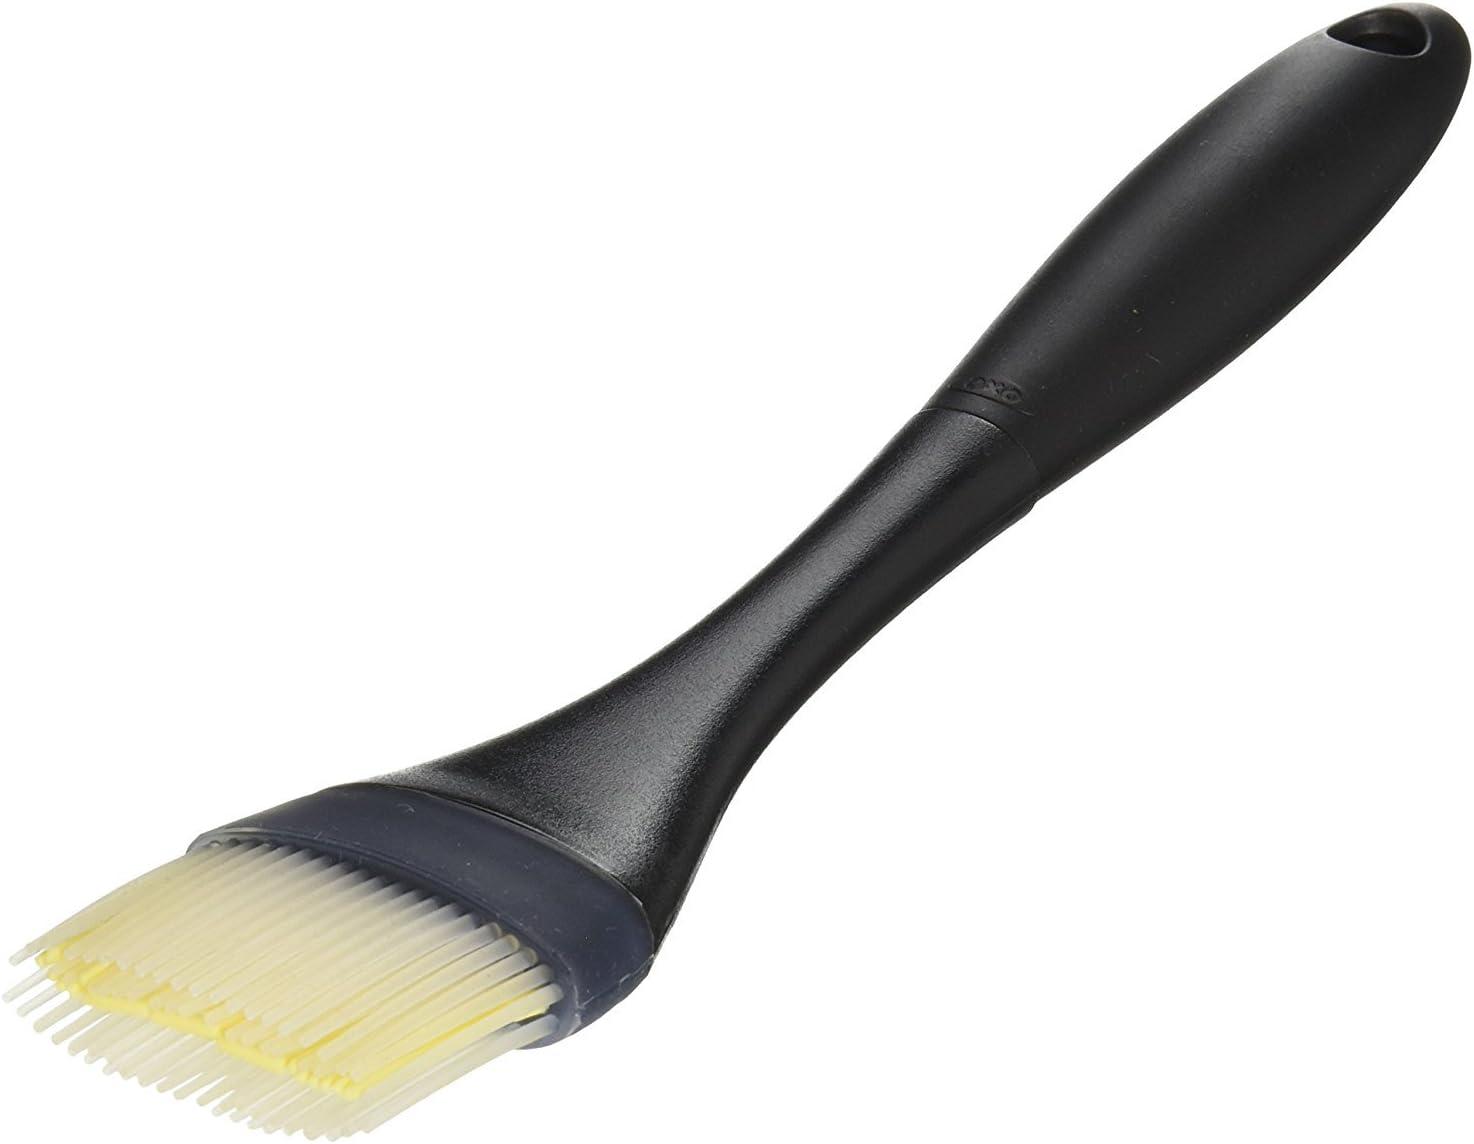 Image of Basting/Pastry Brush